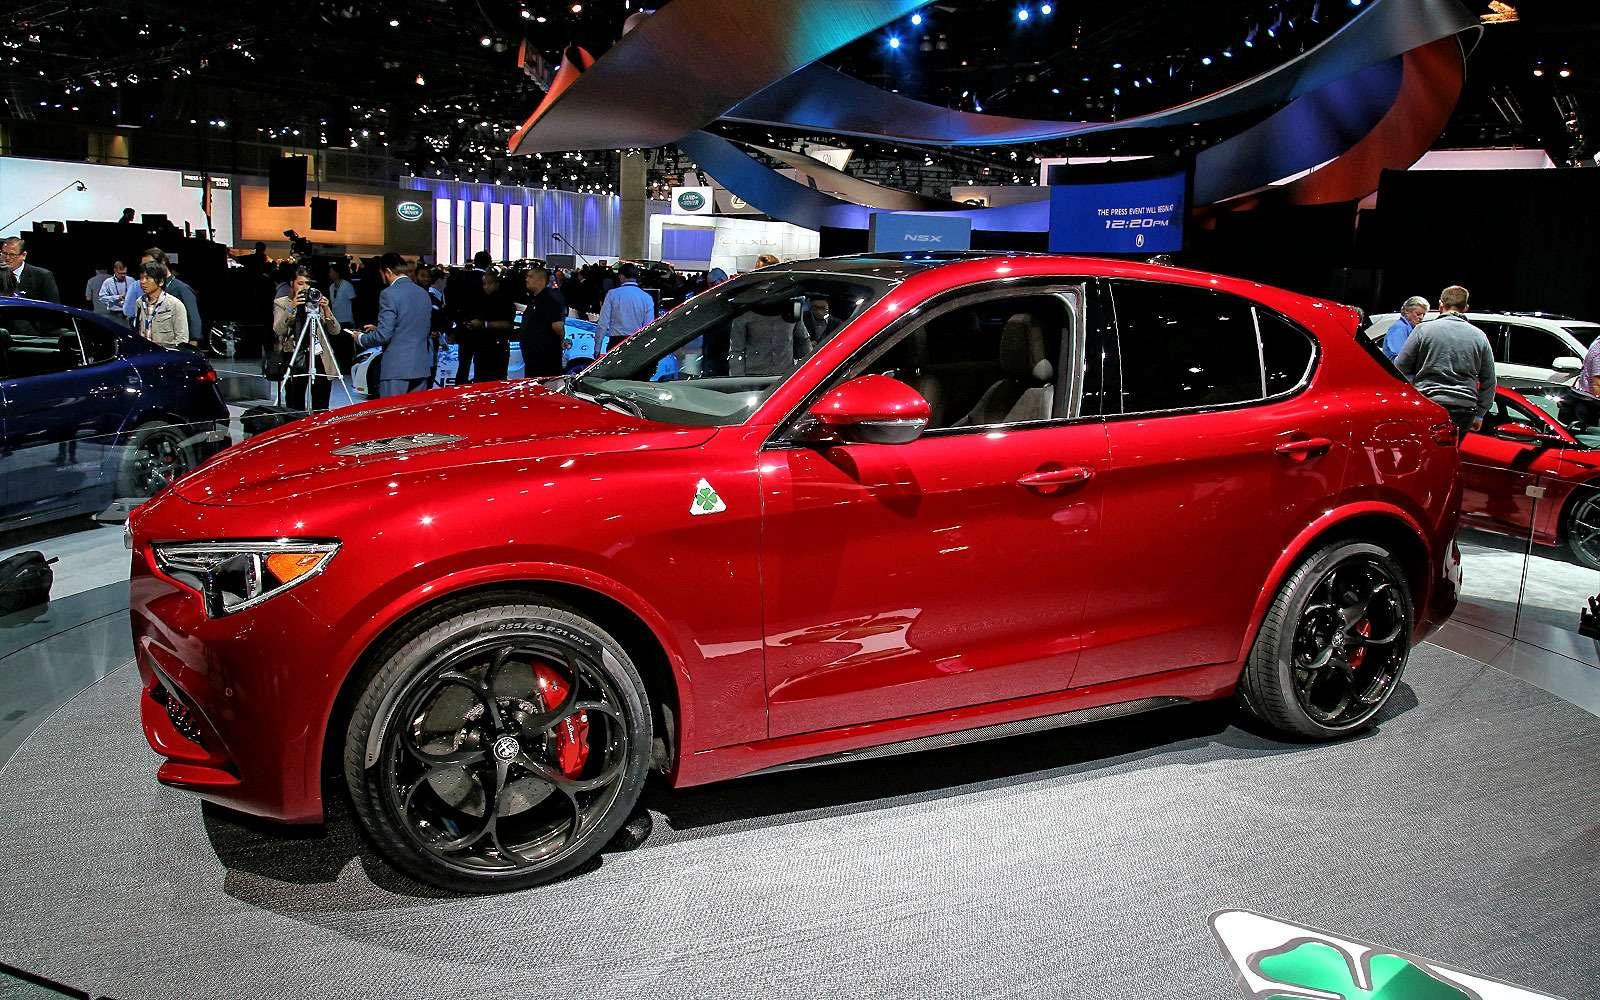 Сила духа: встречайте кроссовер Alfa Romeo Stelvio!— фото 665104